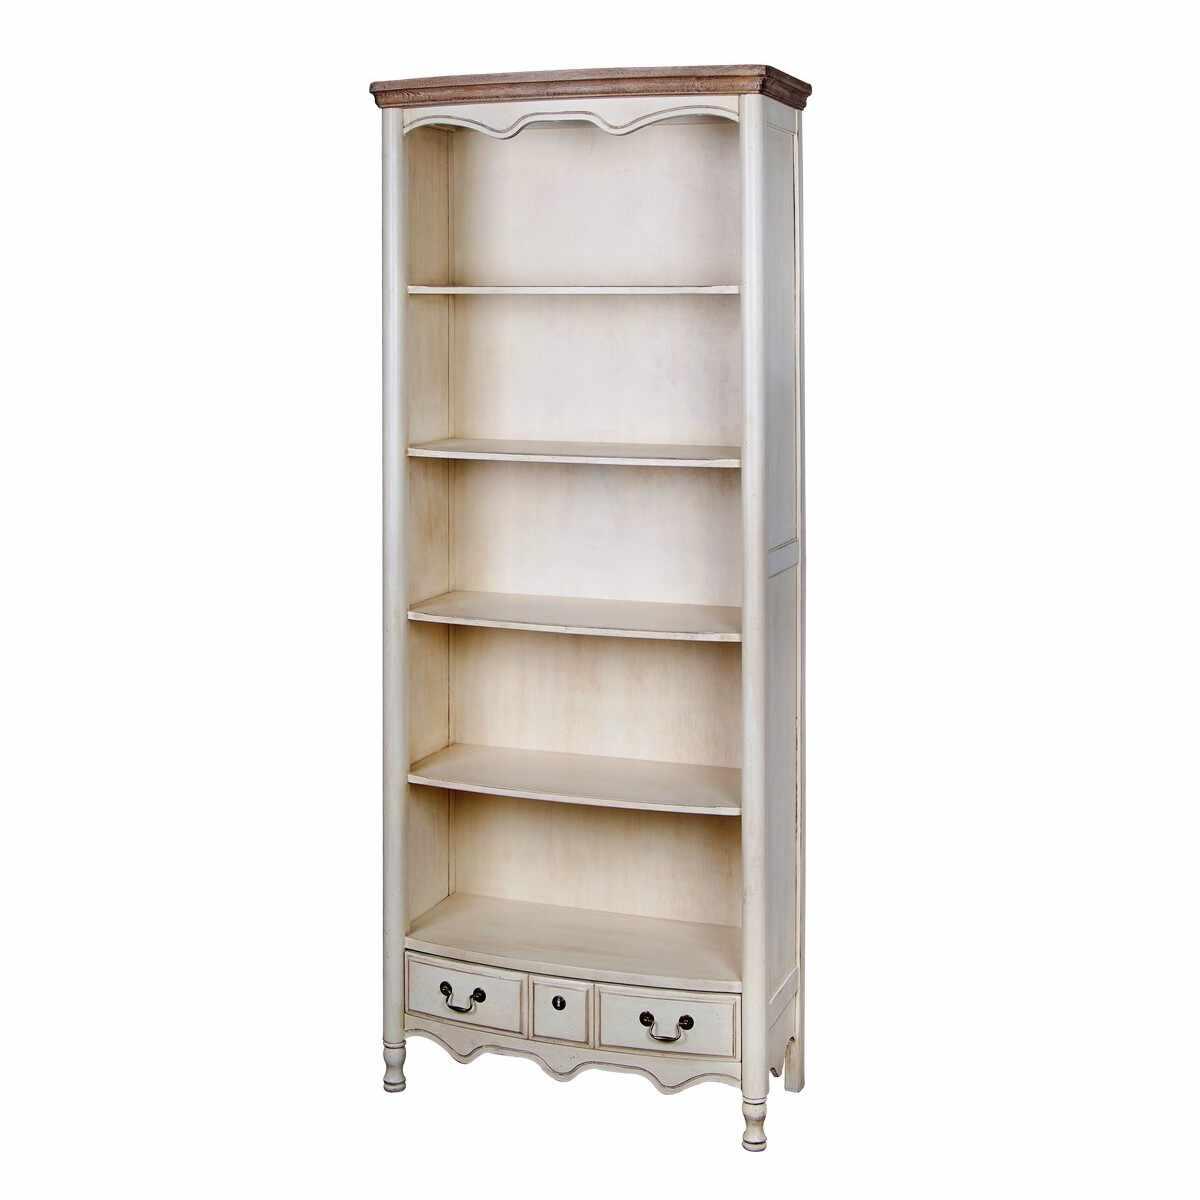 Biblioteca din lemn de cauciuc si furnir, cu 1 sertar Limena LI819 Ivory, l80xA39xH192 cm la pret 3977 lei